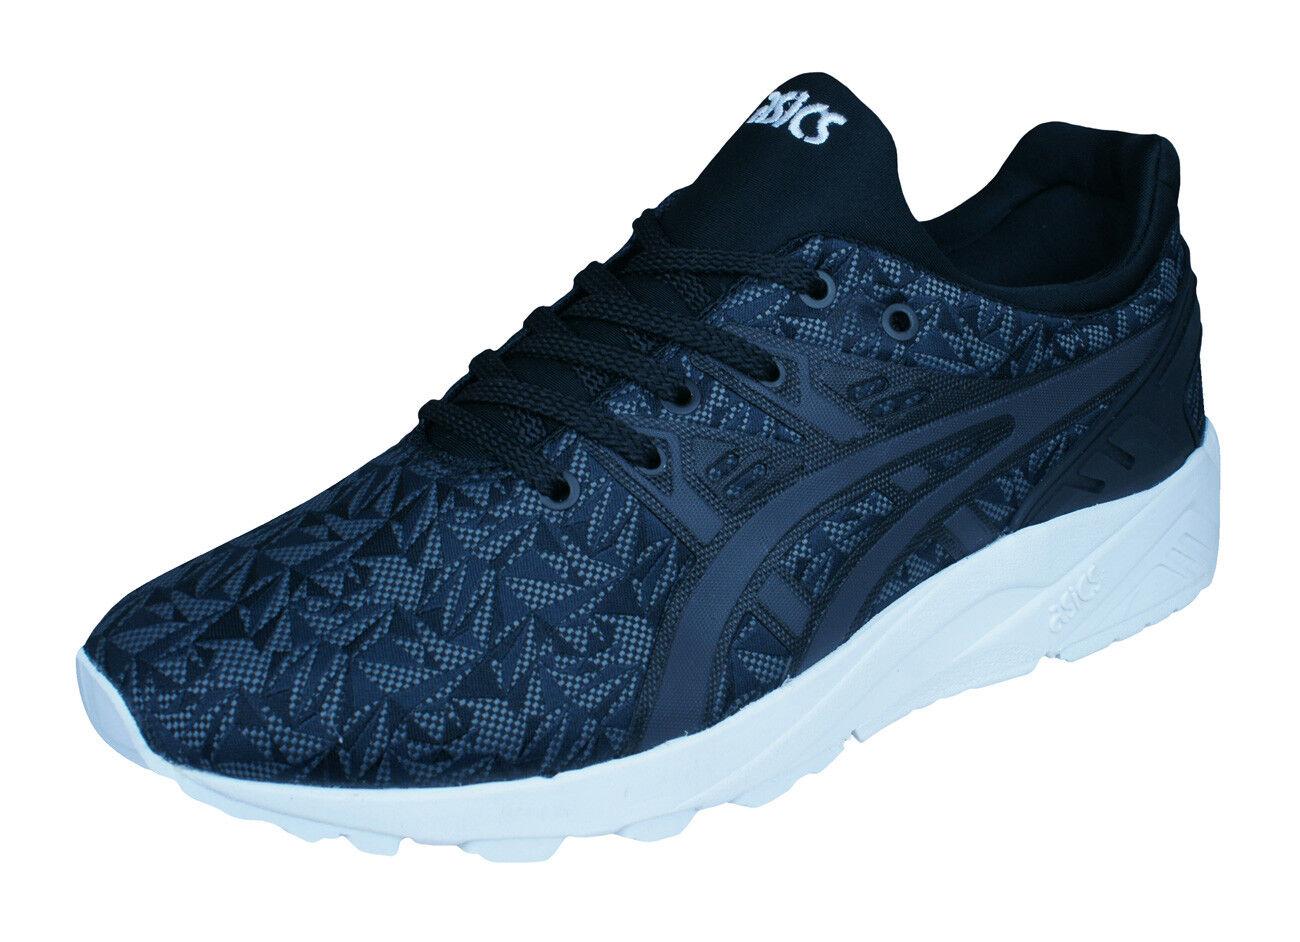 Asics Gel Kayano Trainer EVO Mens Running Sneakers / Shoes - Black Gray